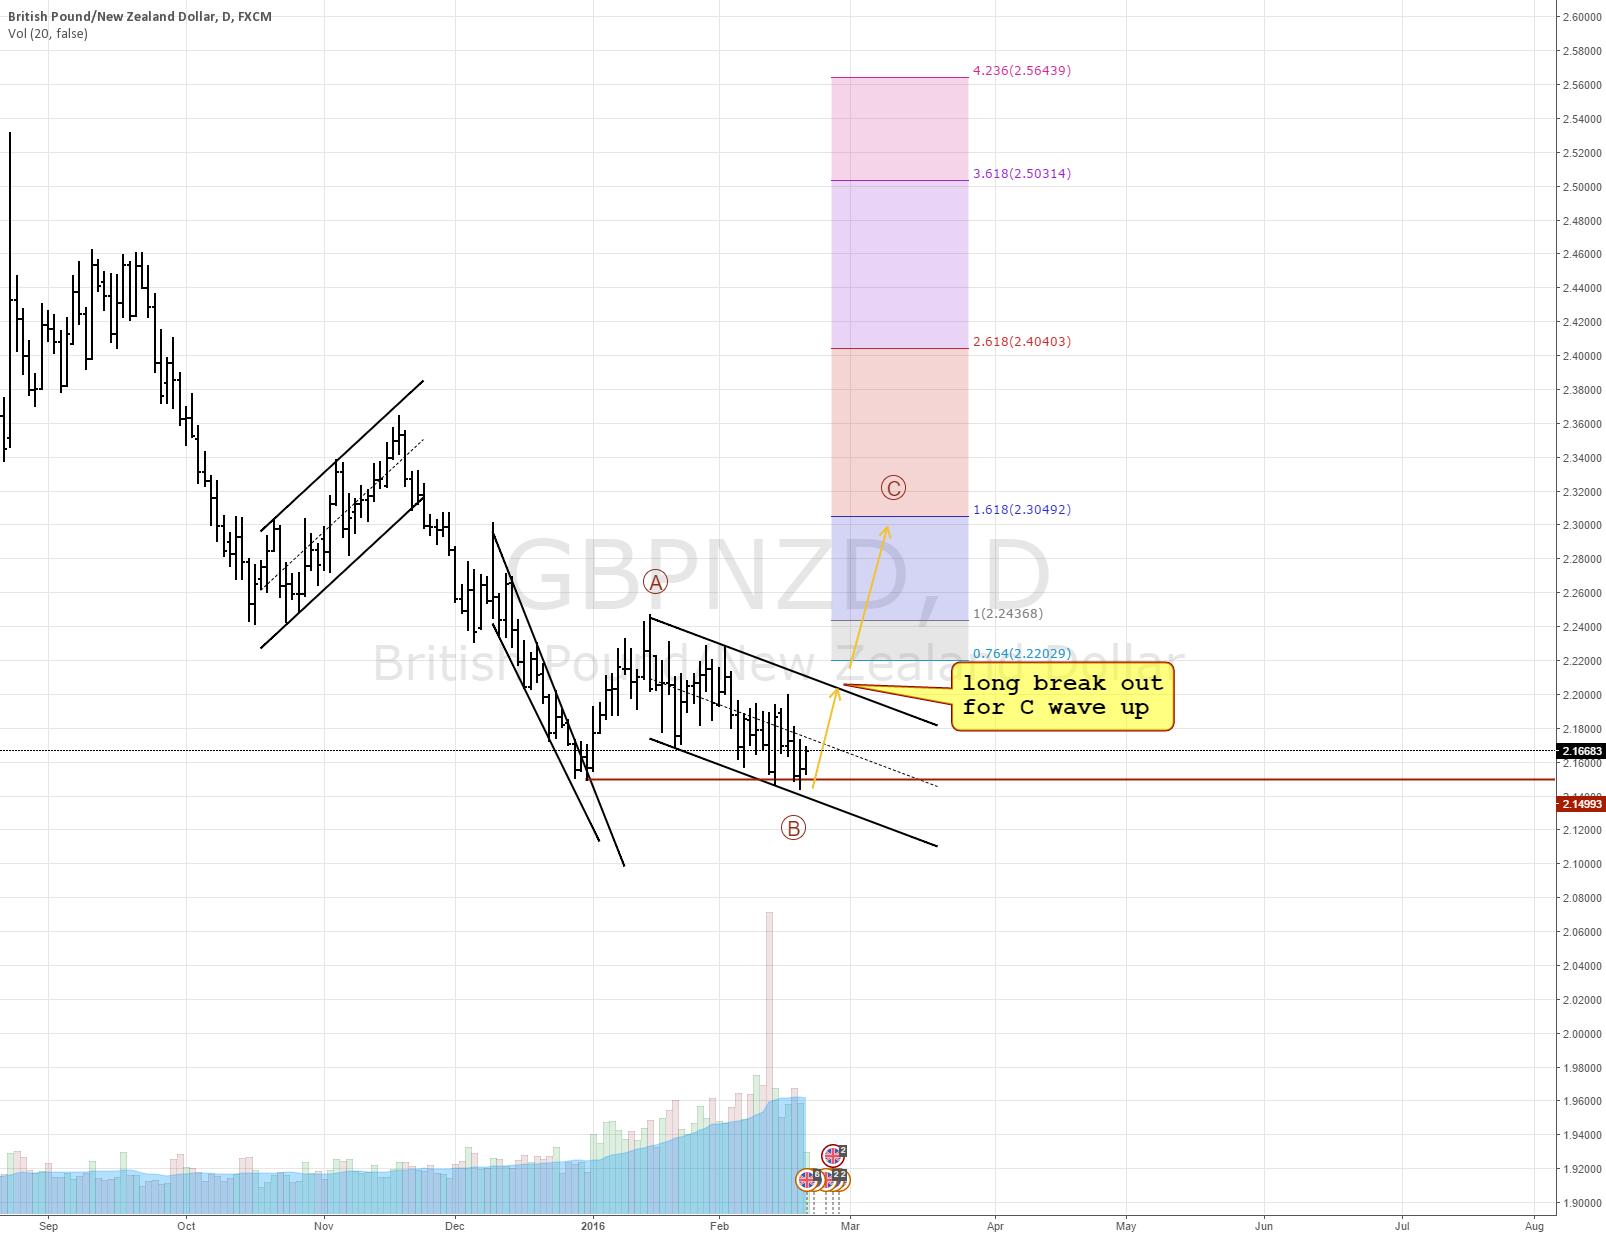 GBPNZD expanding flat scenario